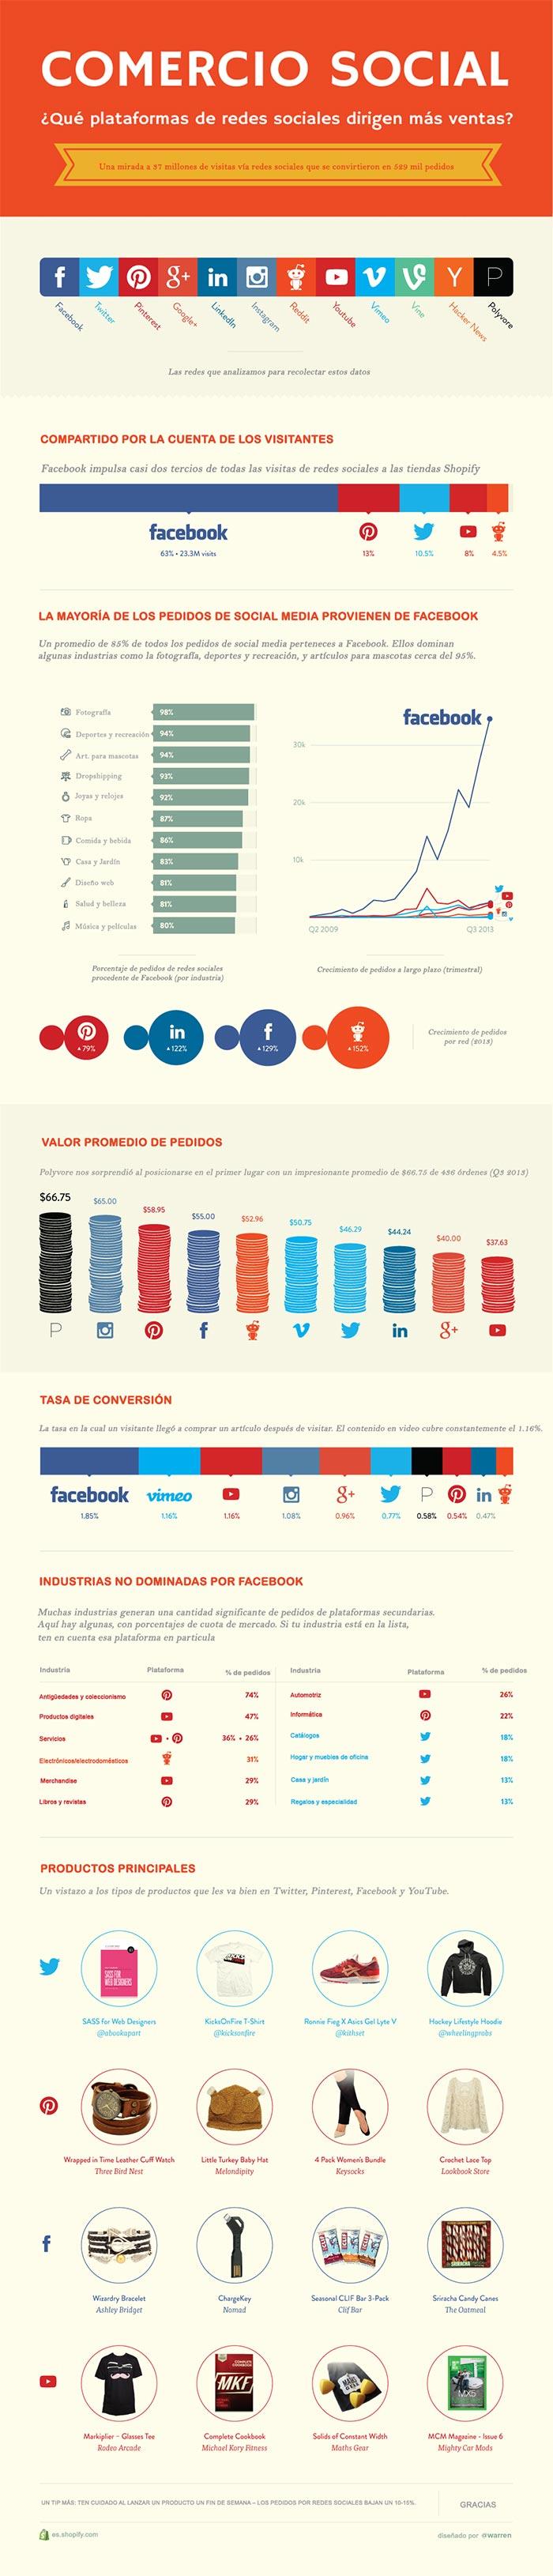 Infografia sobre las redes sociales que mas venden